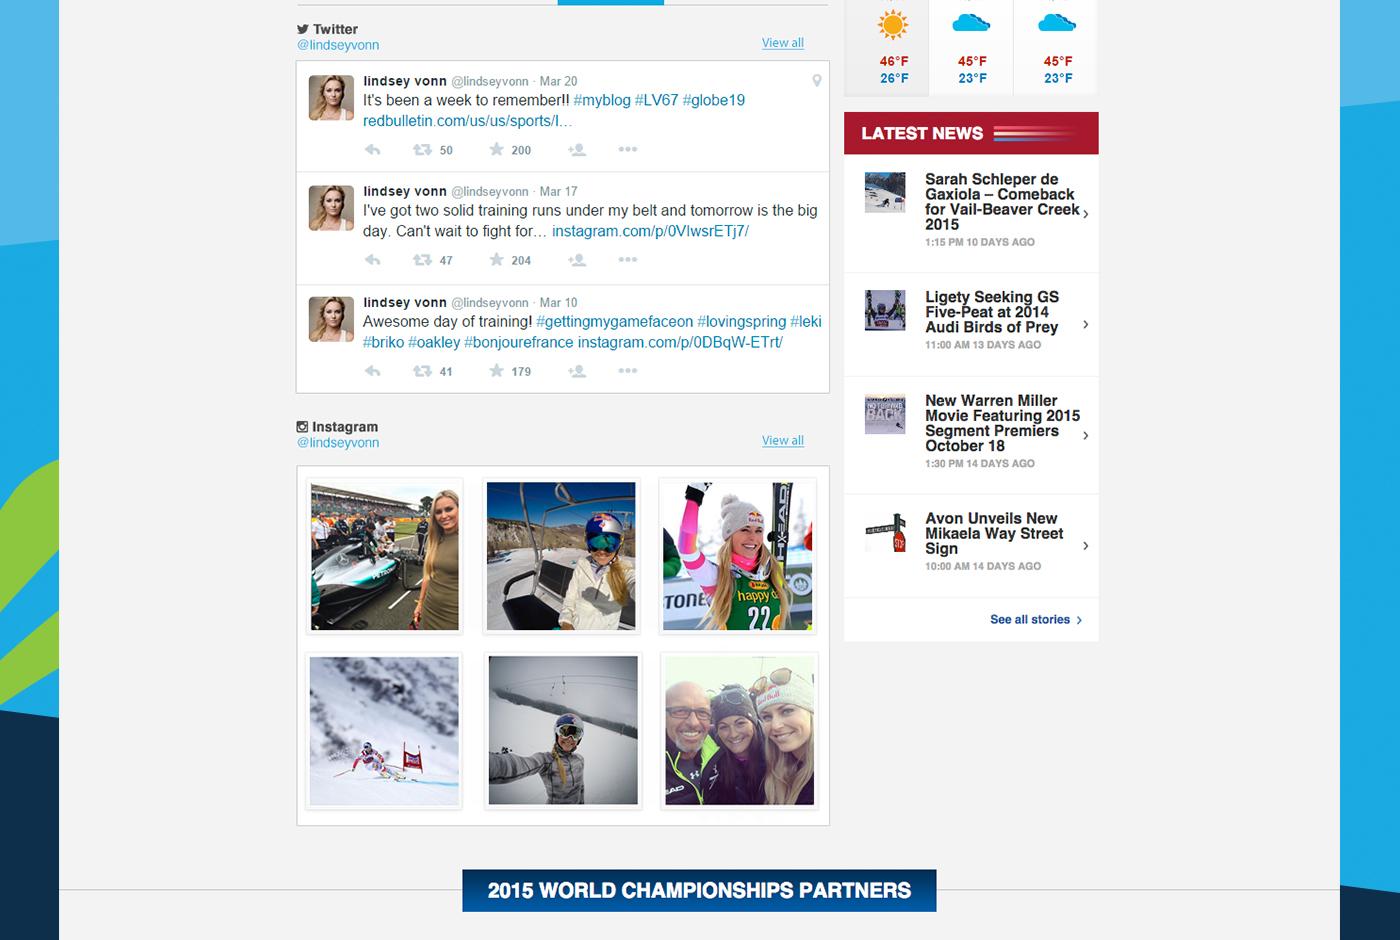 Ski sports Vail 2015 fis World Alpine Ski wrecking ball Vail Valley Foundation 2015 World Alpine Web & Mobile